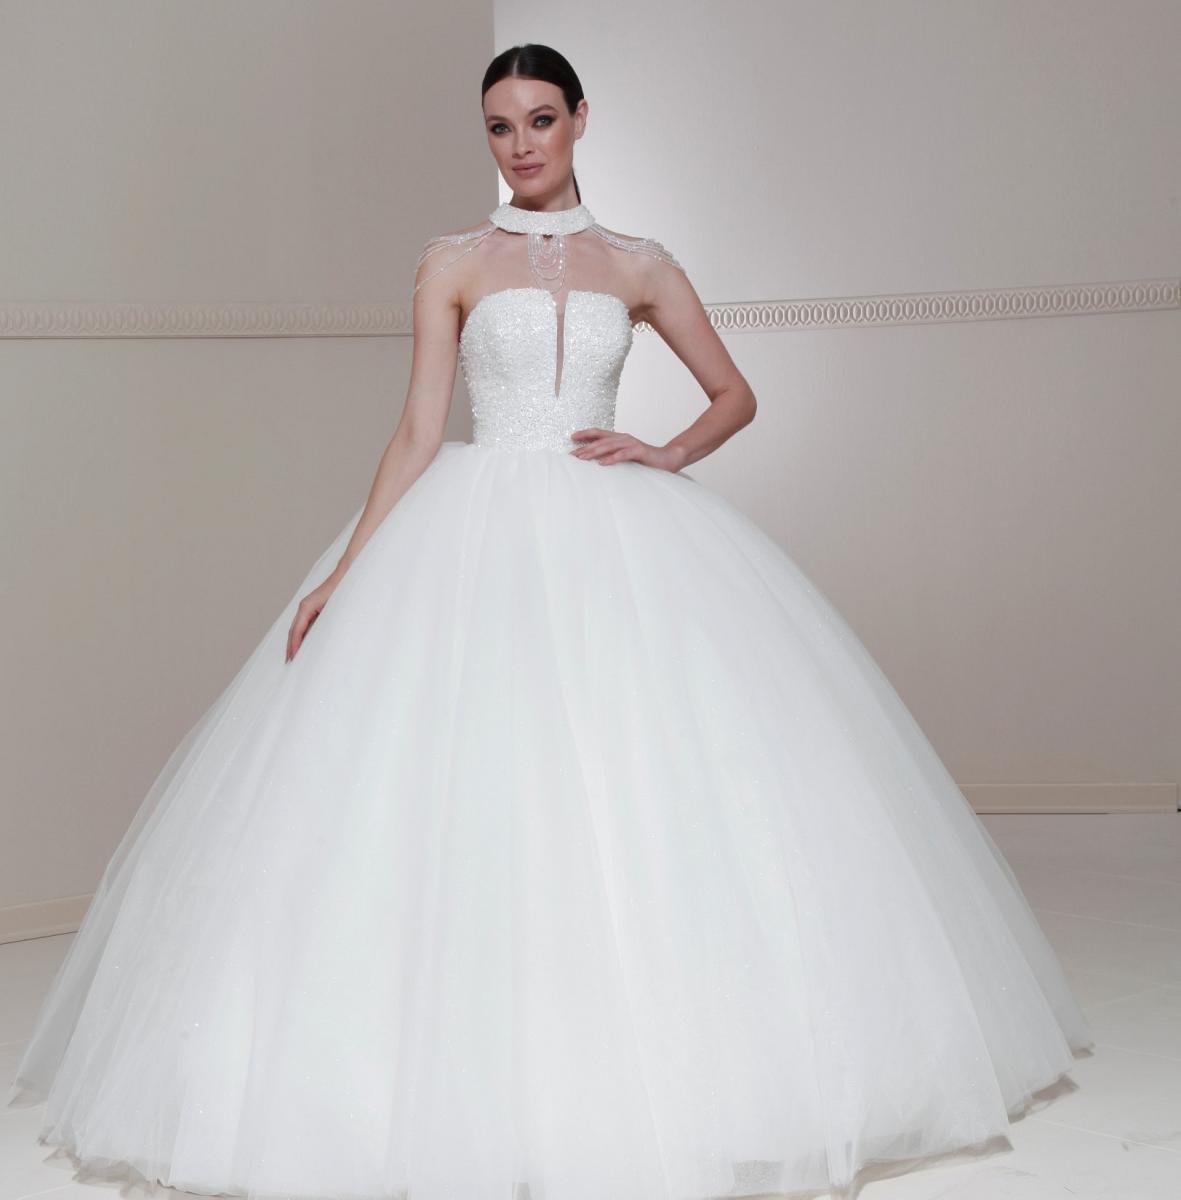 celli-spose-sposa-2022_CRYSTALLINE-BRIDALS-2842-3